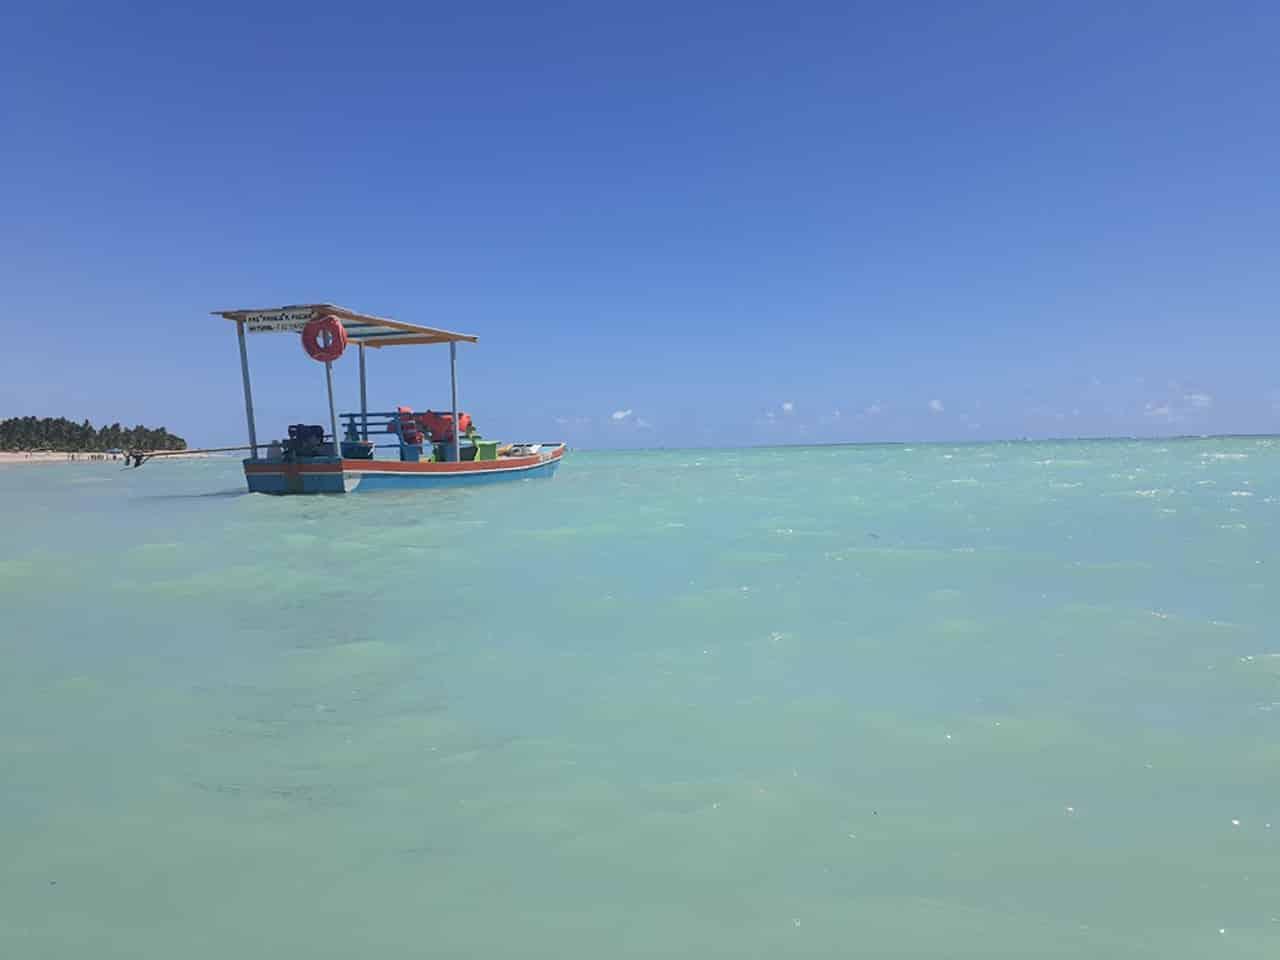 destinos para viajar no brasil